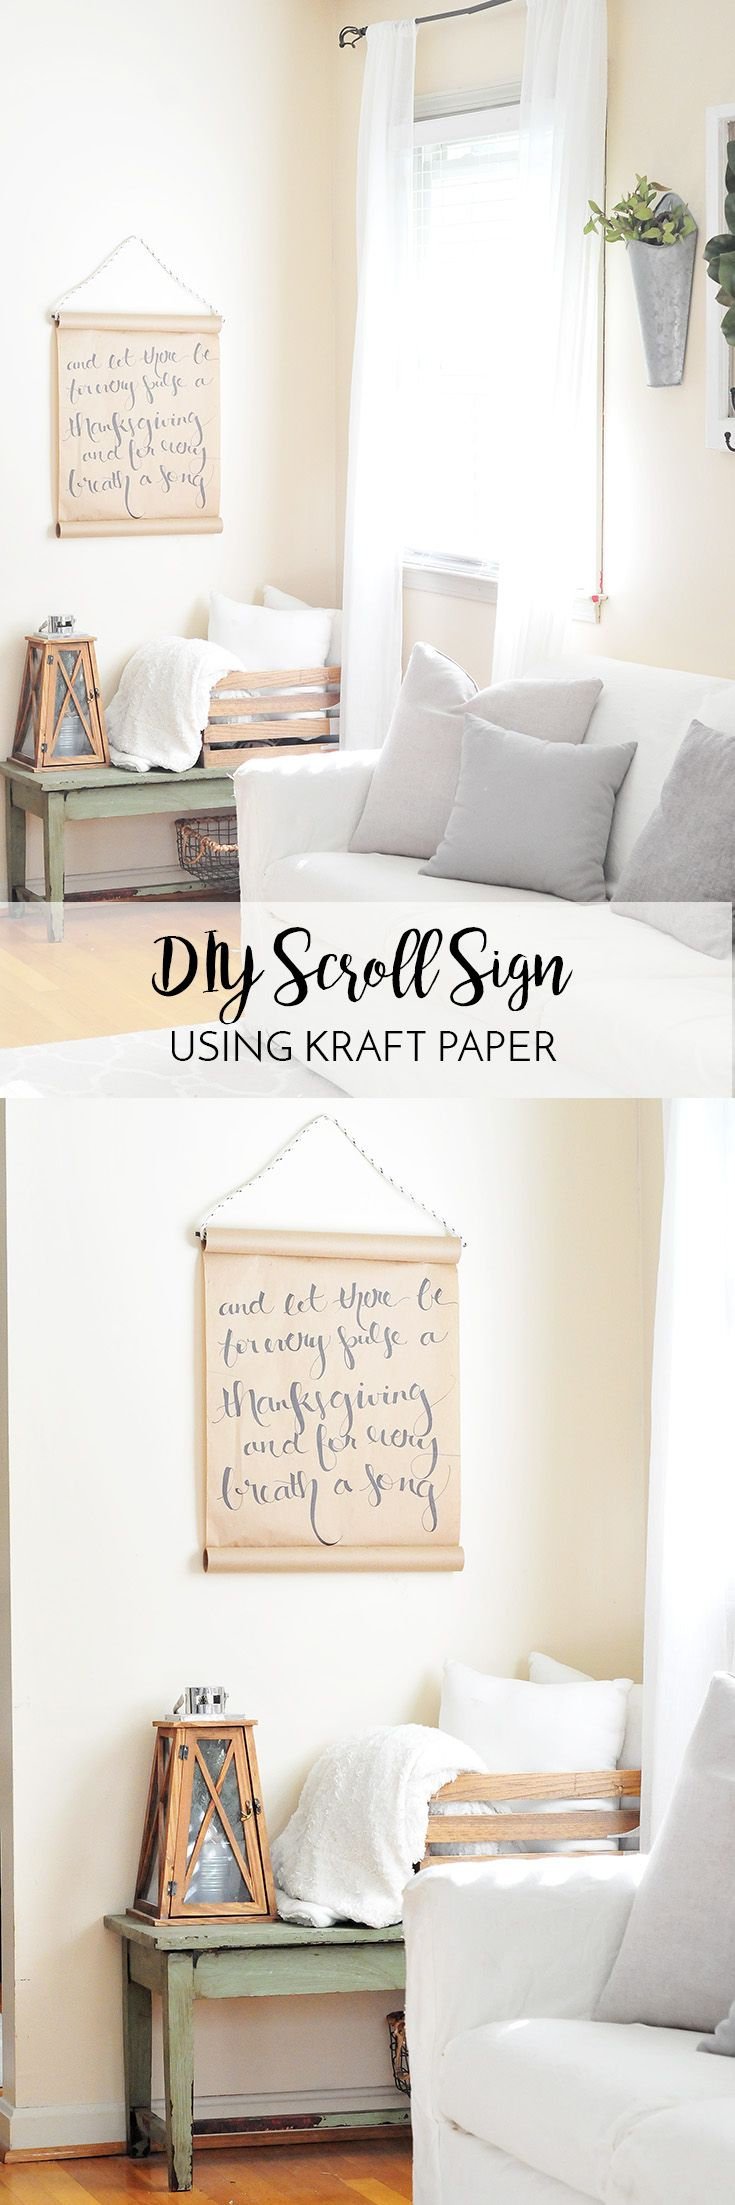 12+ Room decor diy easy ideas